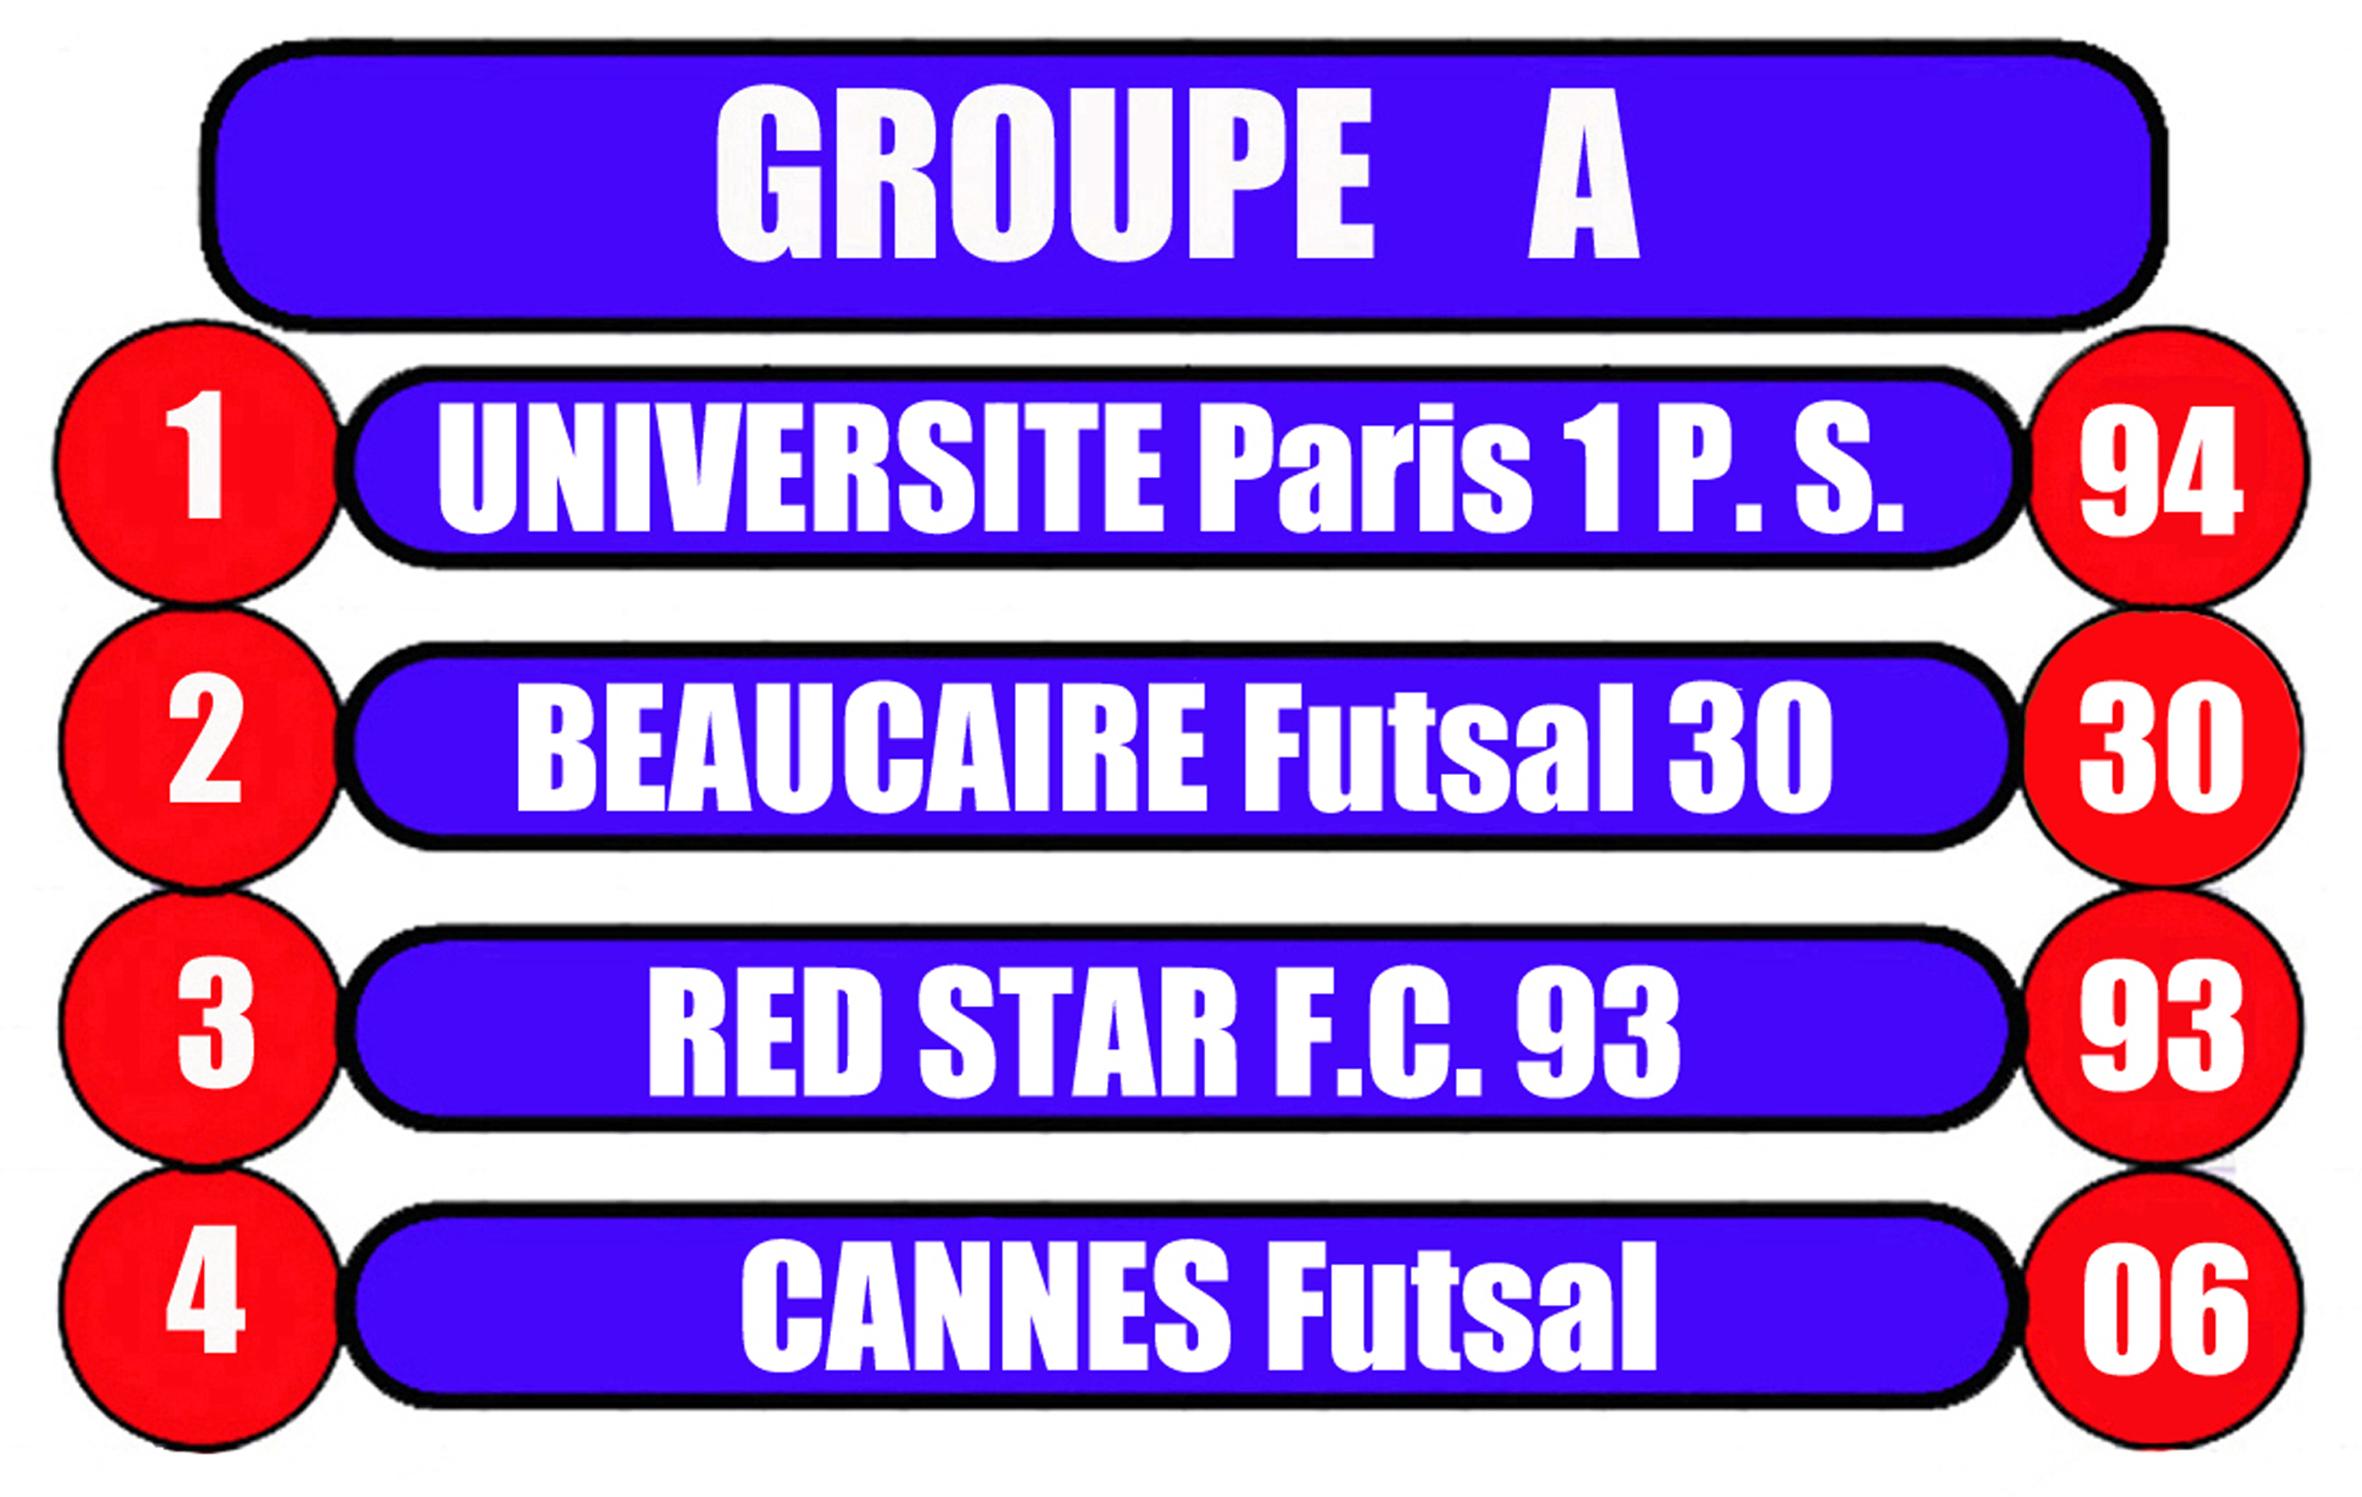 Groupe A avec Beaucaire Futsal 30